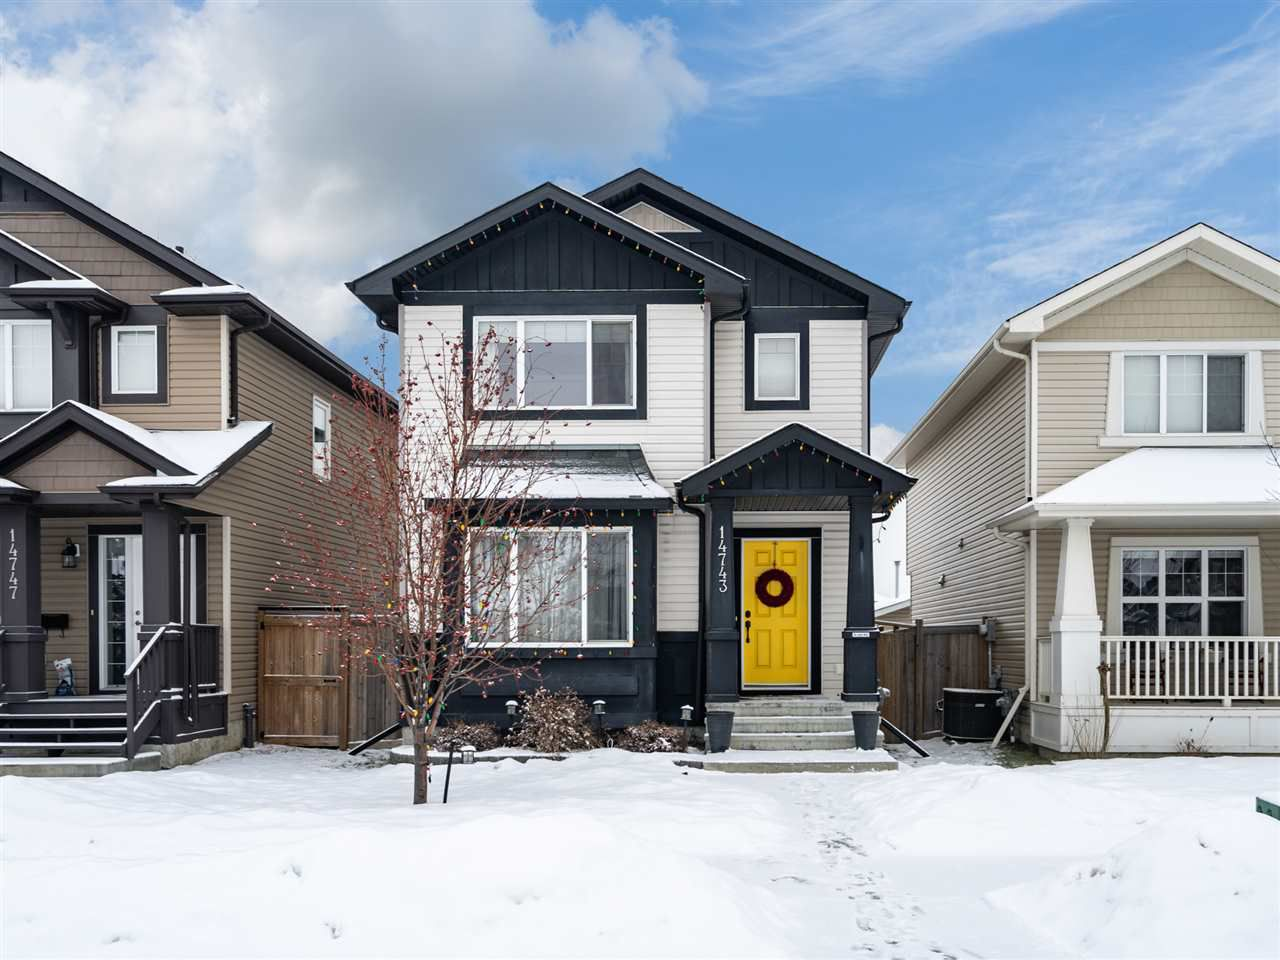 Main Photo: 14743 141 Street in Edmonton: Zone 27 House for sale : MLS®# E4142407